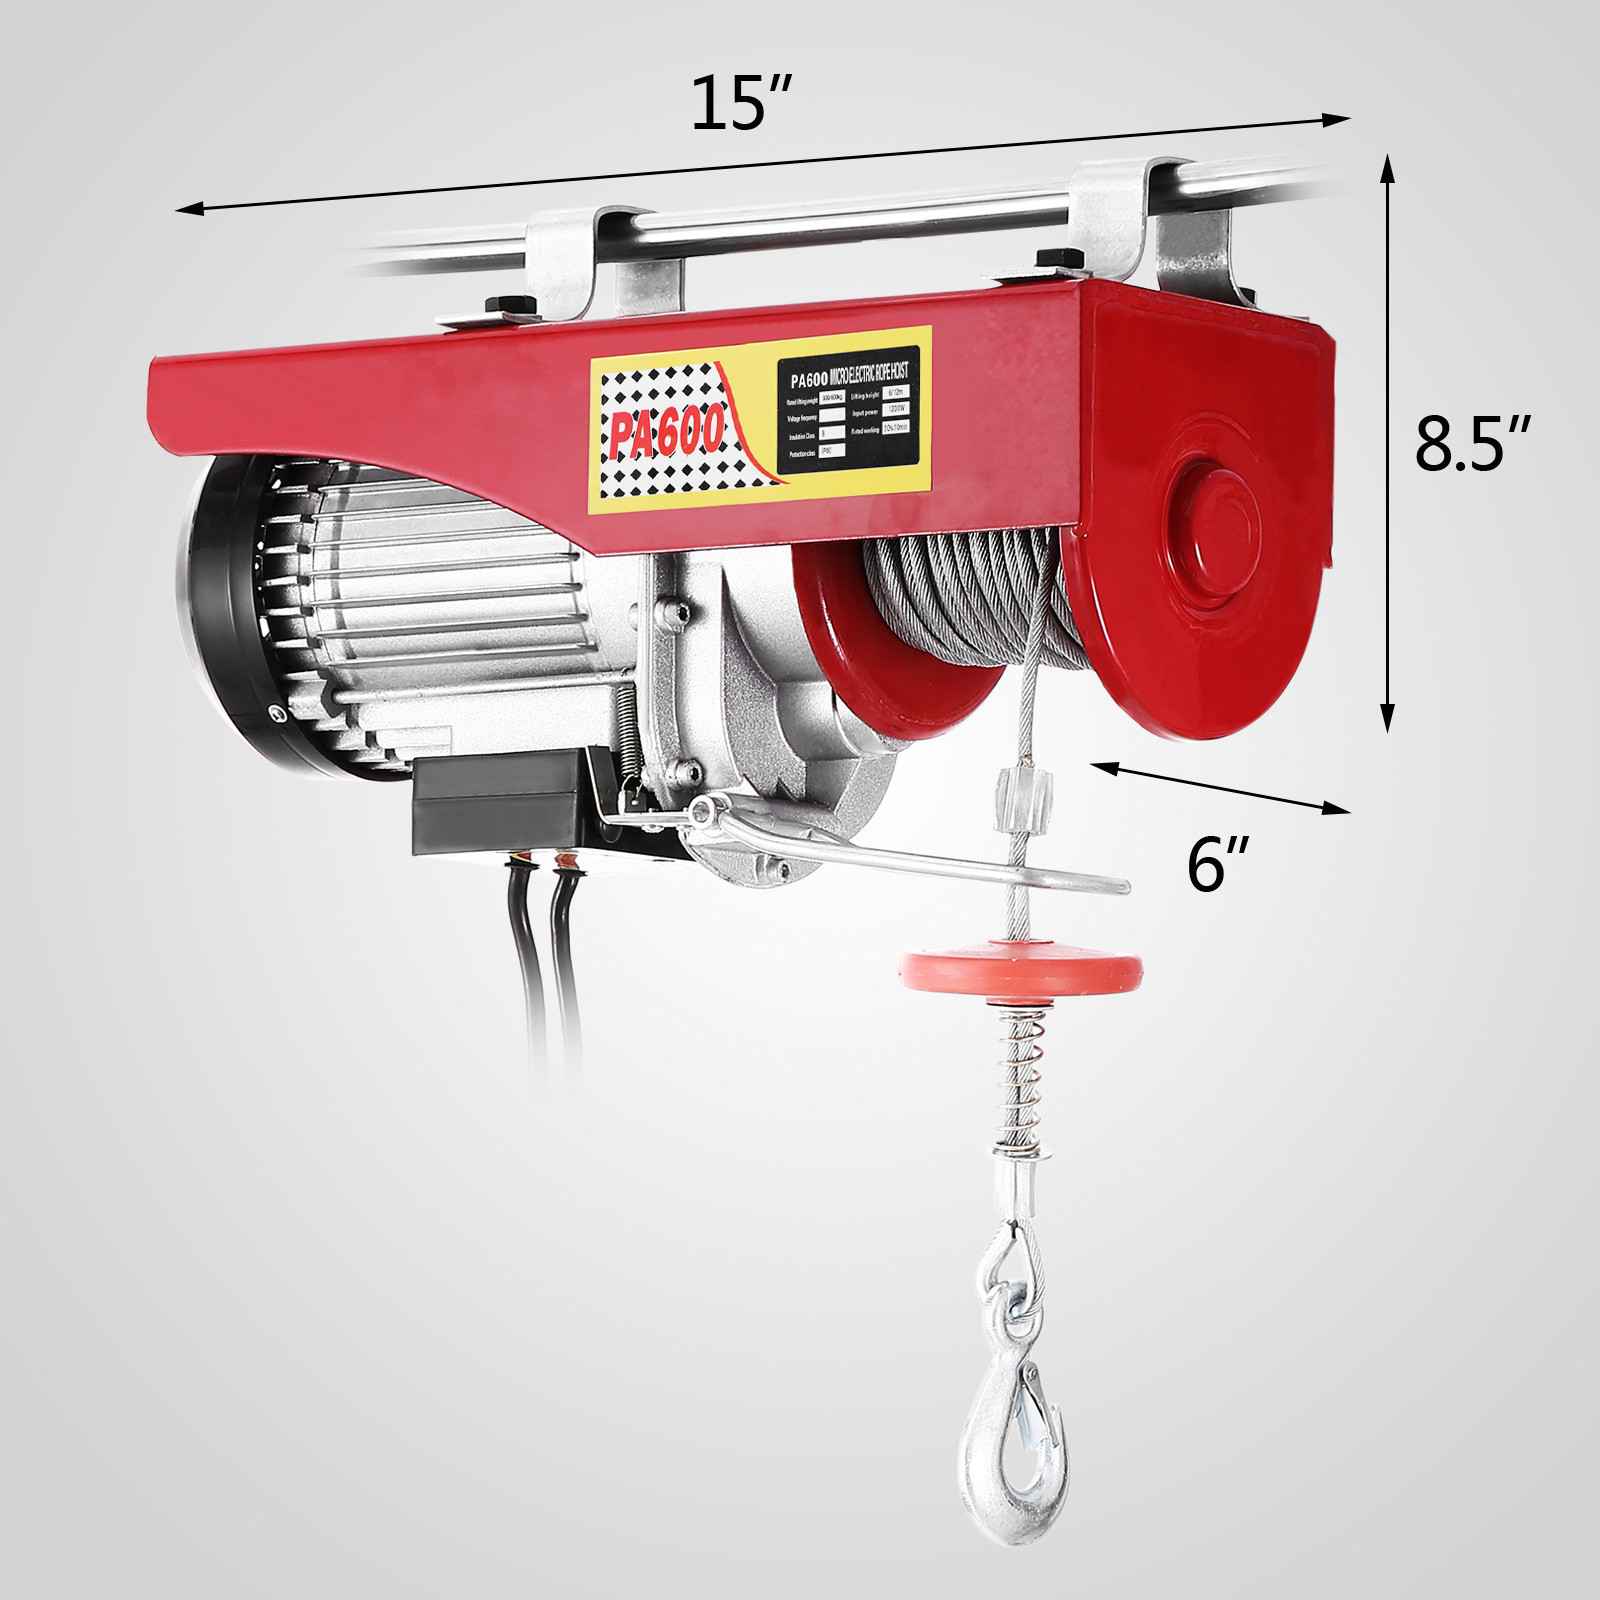 100kg-900kg-Electric-Hoist-Winch-Lifting-Engine-Crane-Cable-Lift-Hook-Garage miniature 38